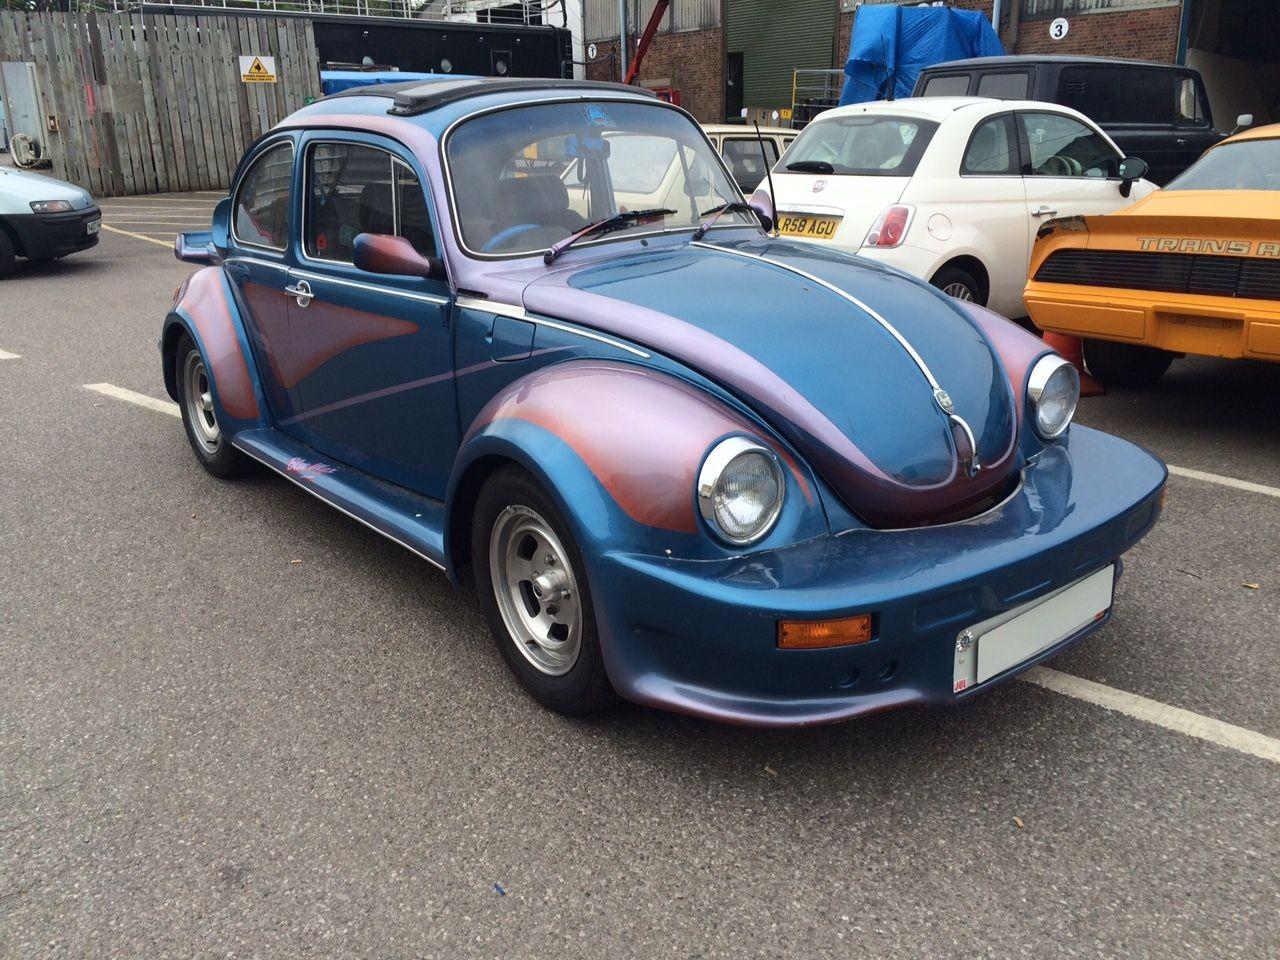 Stunning Www.ebay Motors Uk Pictures Inspiration - Classic Cars ...